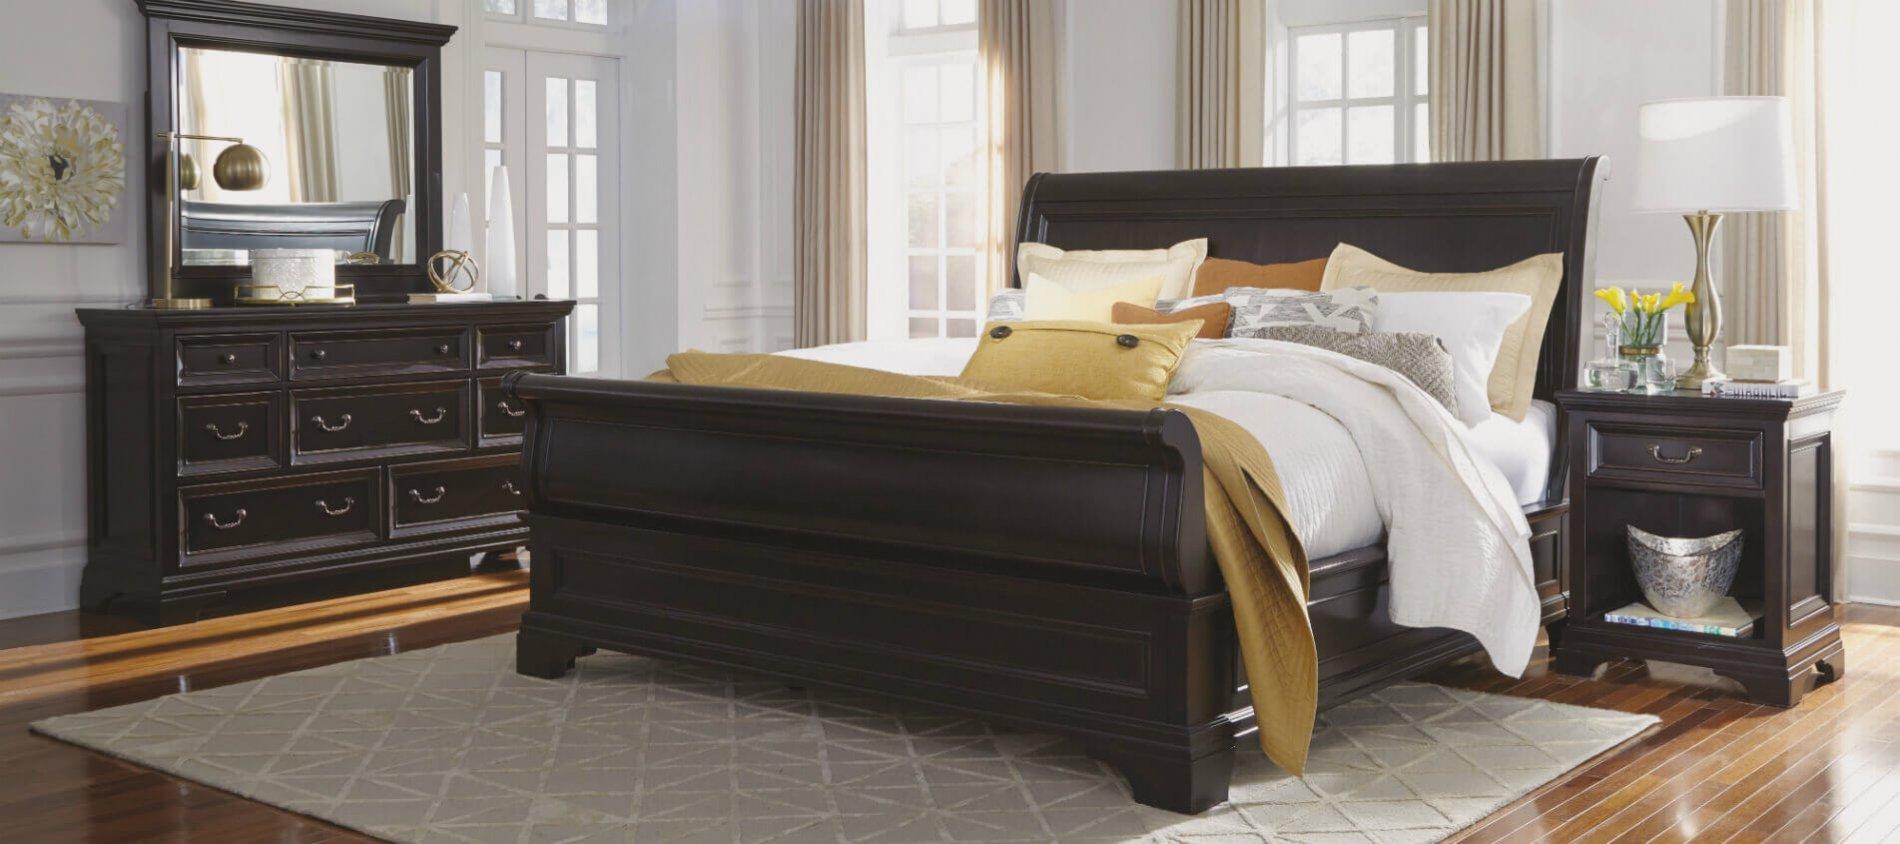 elegant dark wood home furniture collection